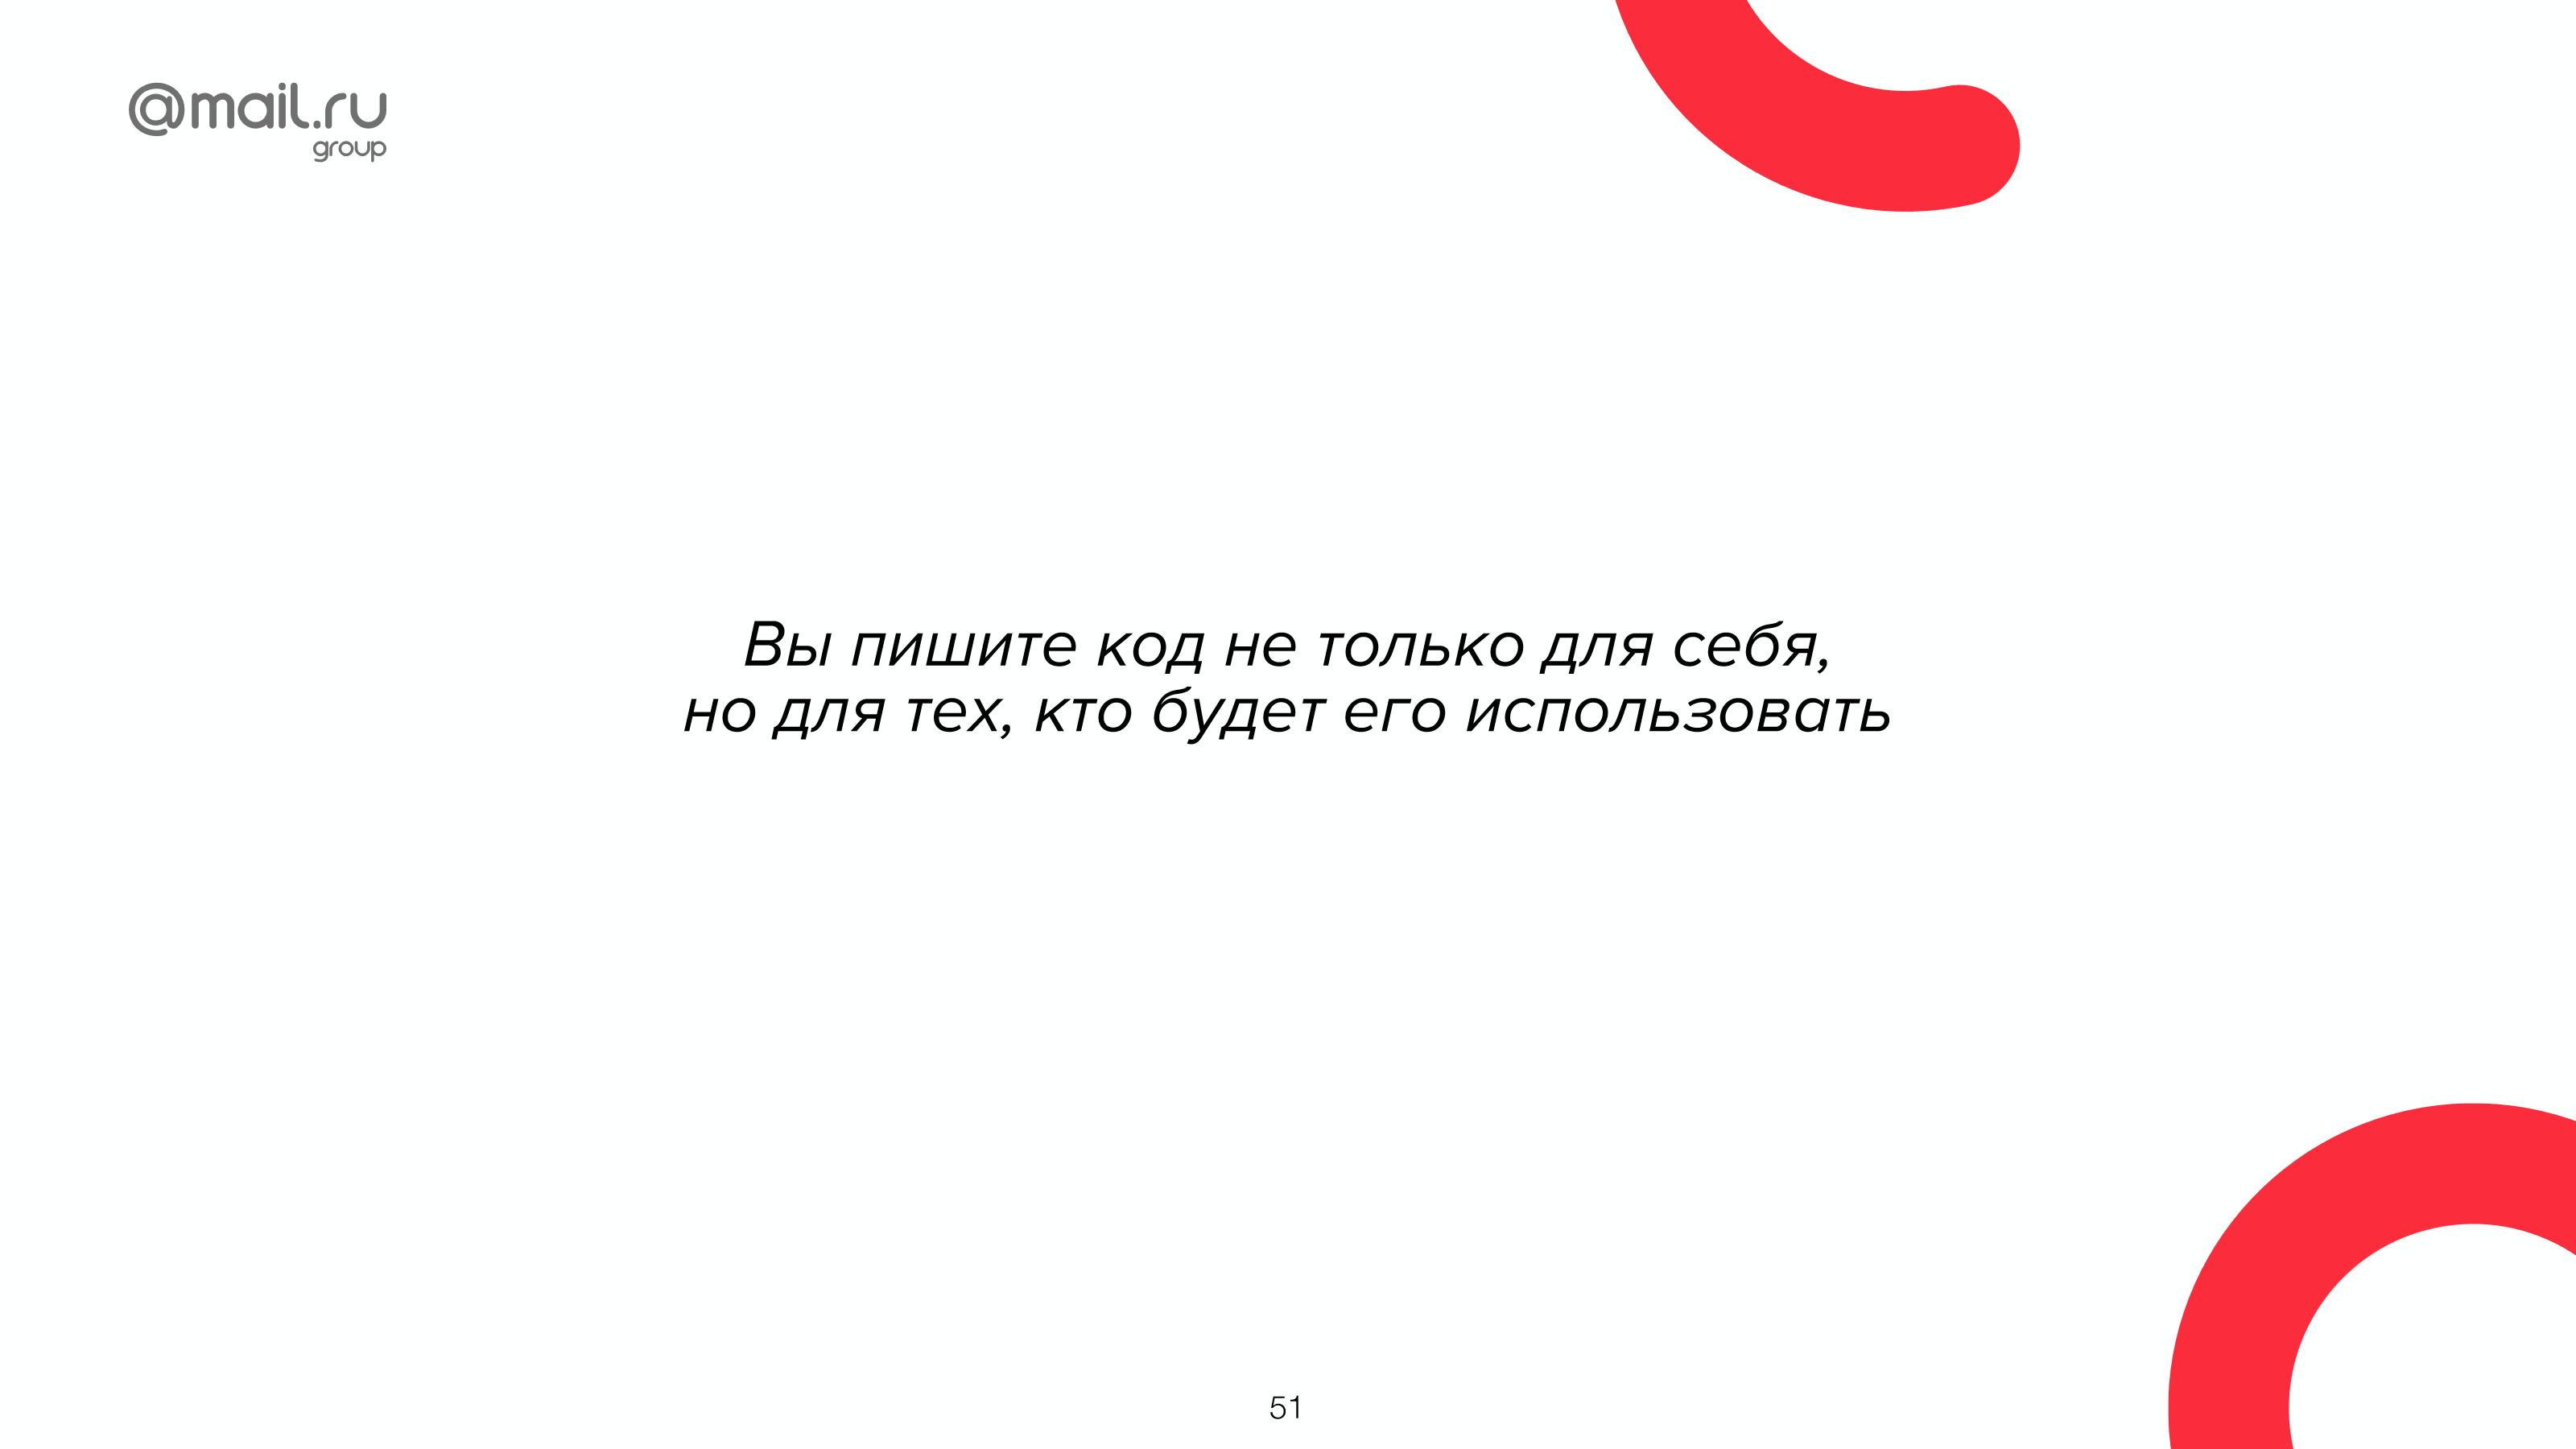 cz4c0htkpnv2ofzs__55tg02stw.png